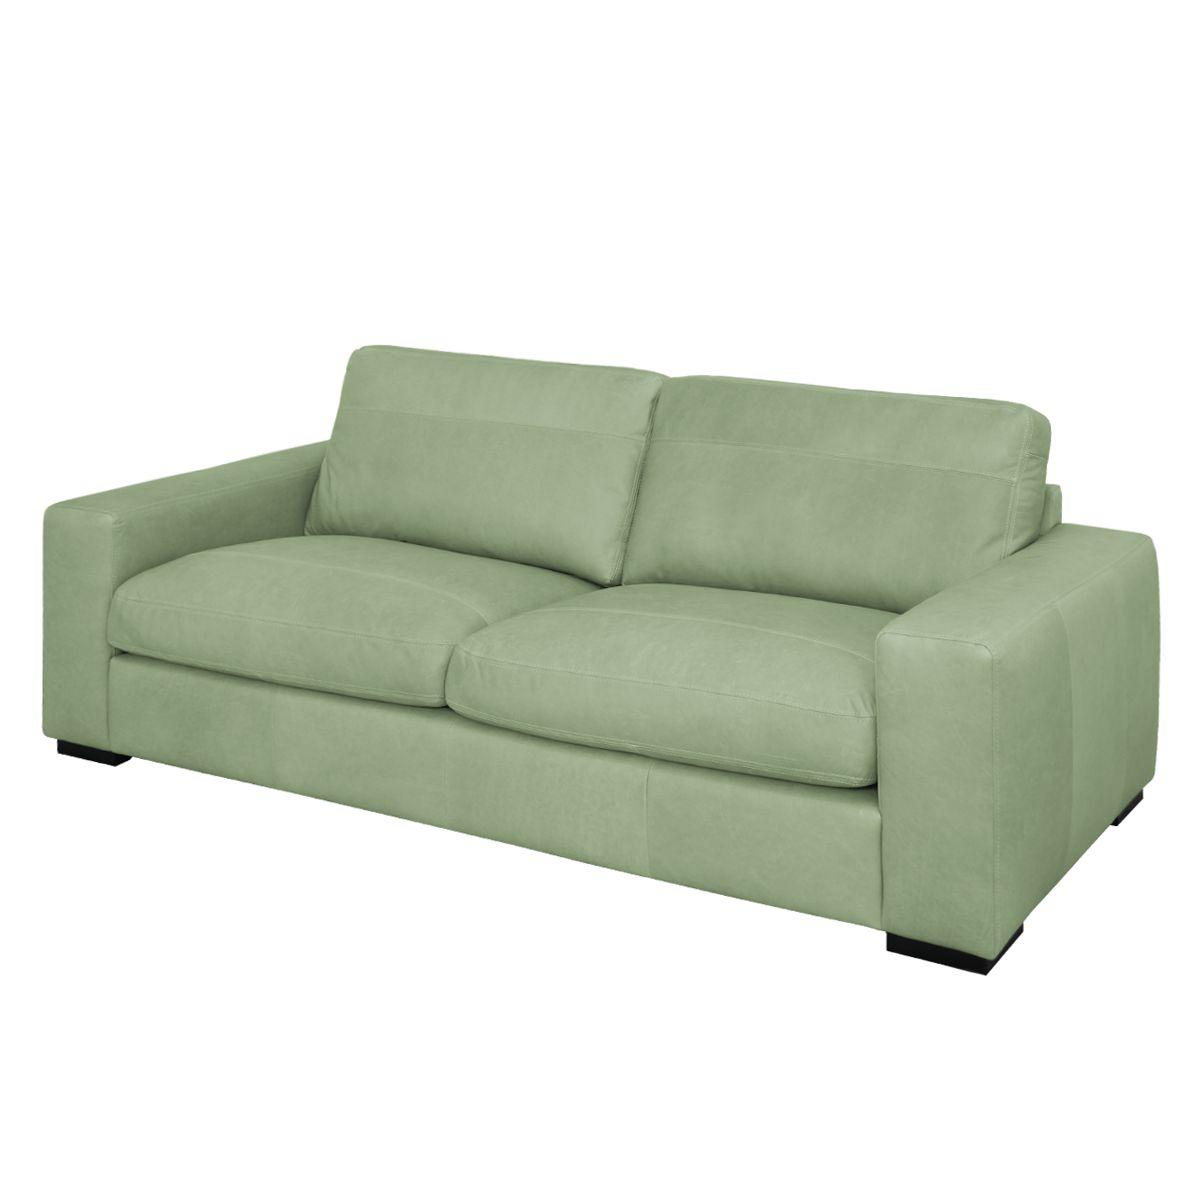 Sofa Riton (3-Sitzer) Echtleder - Olivgrün, Nuovoform - Möbel24 Online